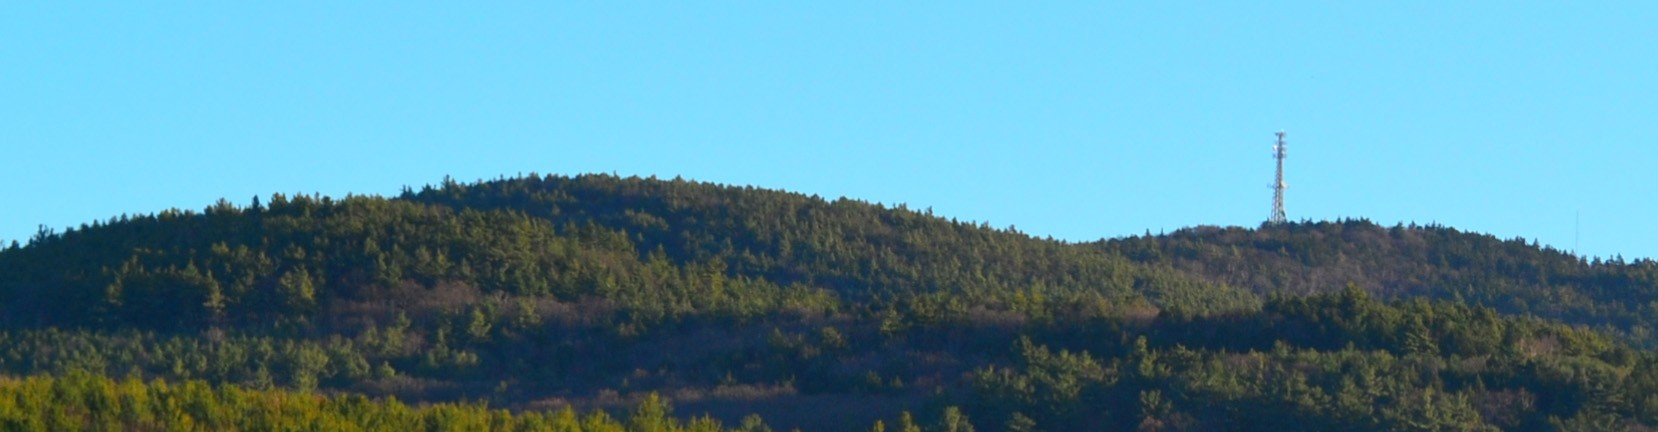 Belknap Range Trails